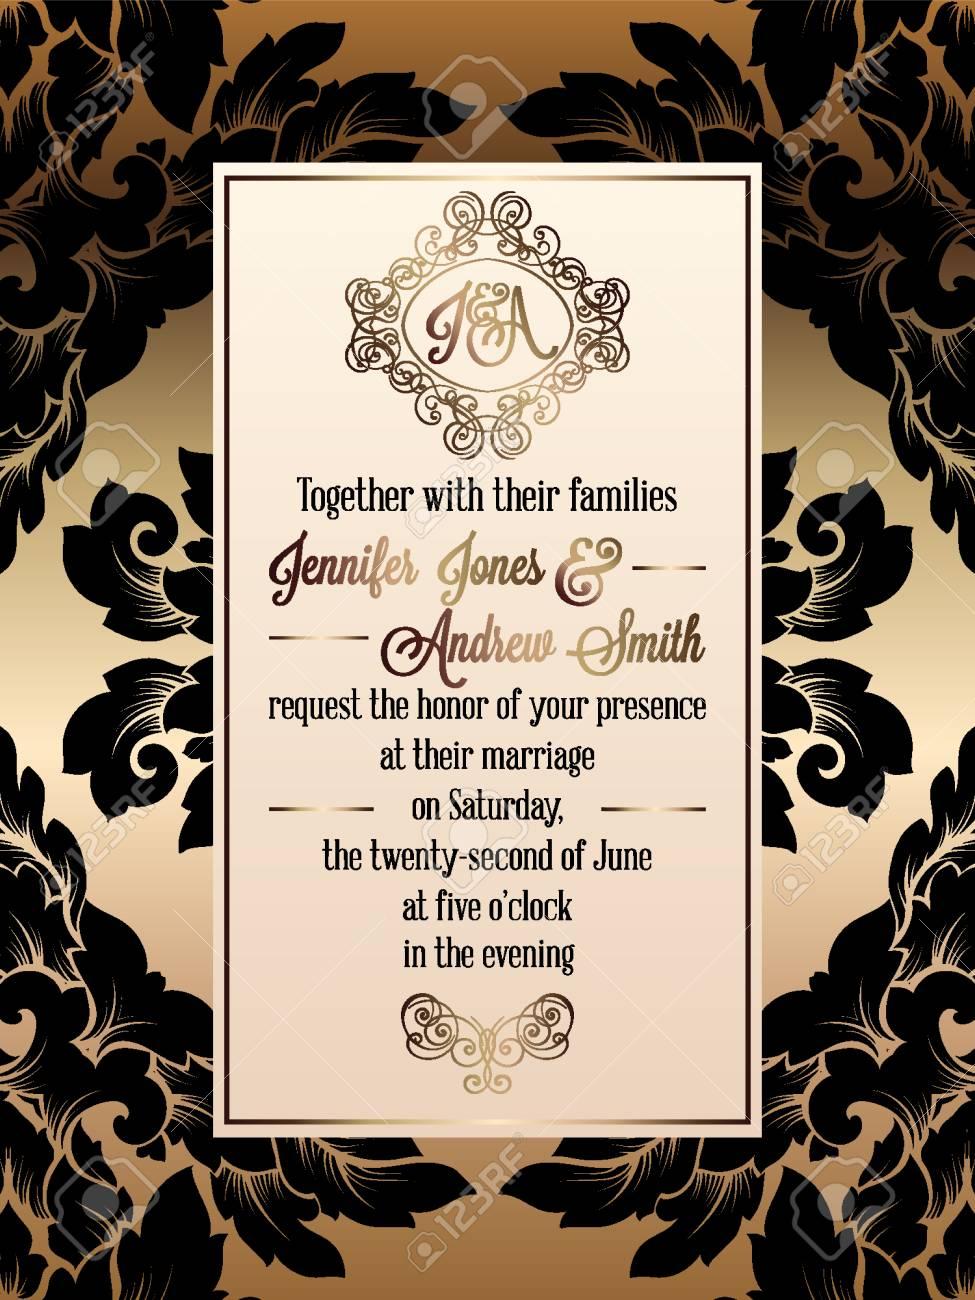 Vintage baroque style wedding invitation card template elegant vector vintage baroque style wedding invitation card template elegant formal design with damask background traditional decoration for wedding stopboris Choice Image